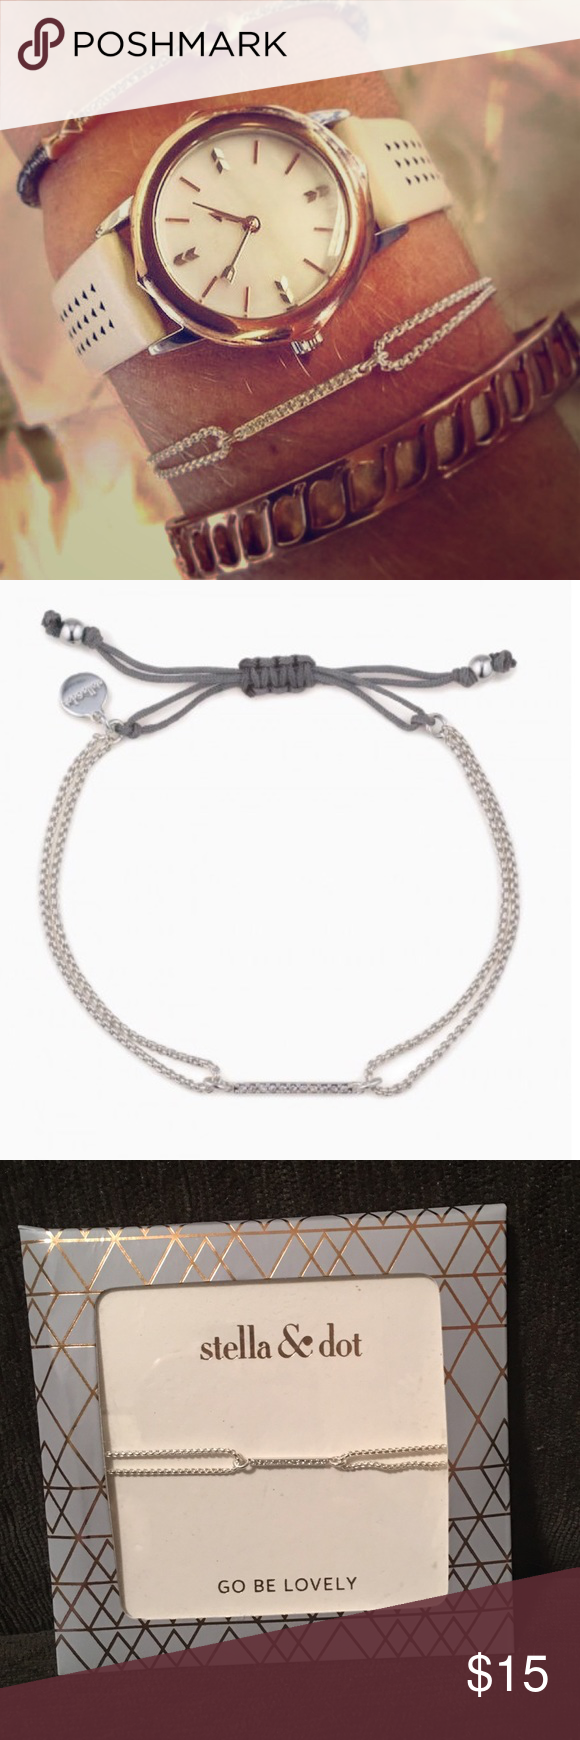 Stella Dot Pave Wishing Bracelet Silver Nwt Nwt My Posh Closet